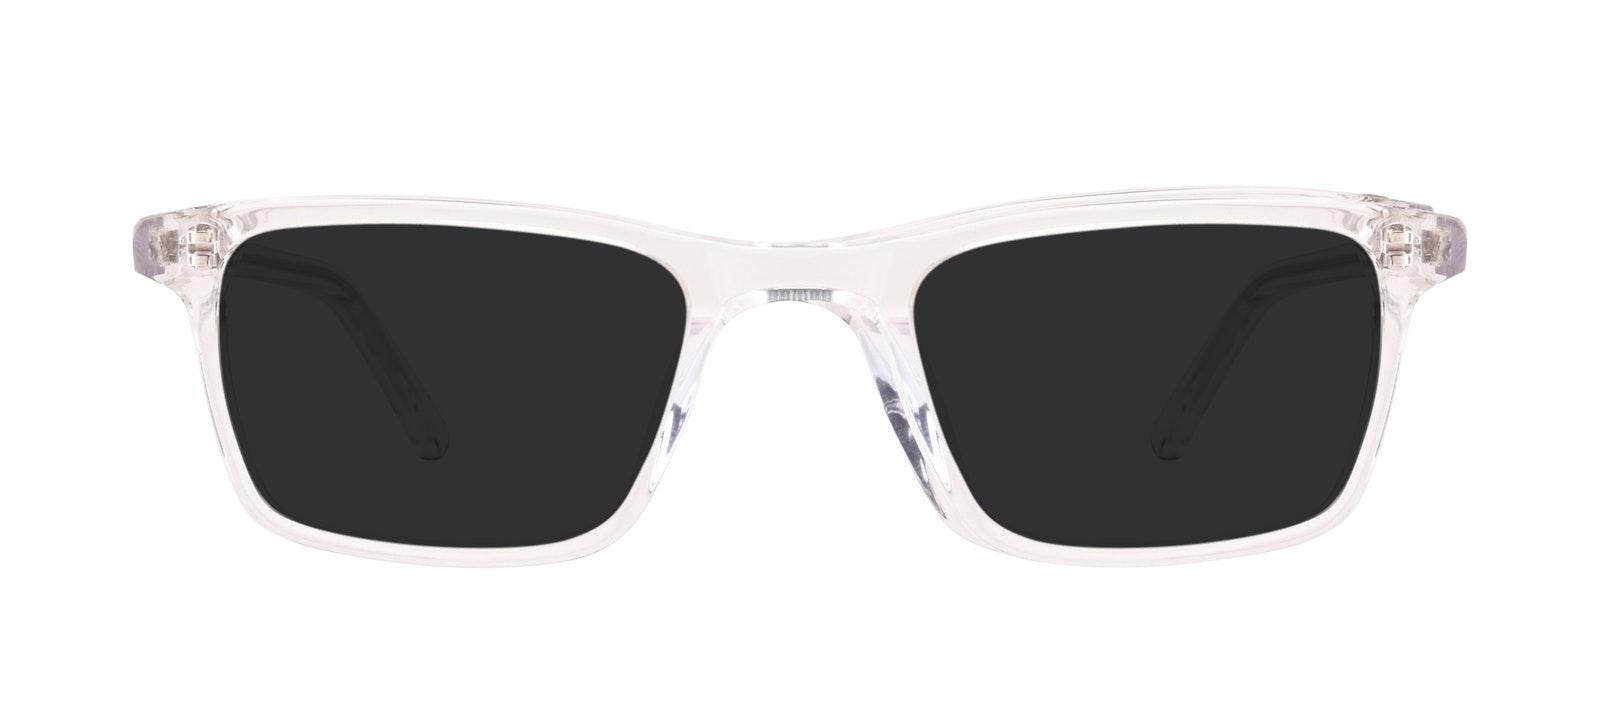 Affordable Fashion Glasses Rectangle Sunglasses Men Henri SML Clear Front